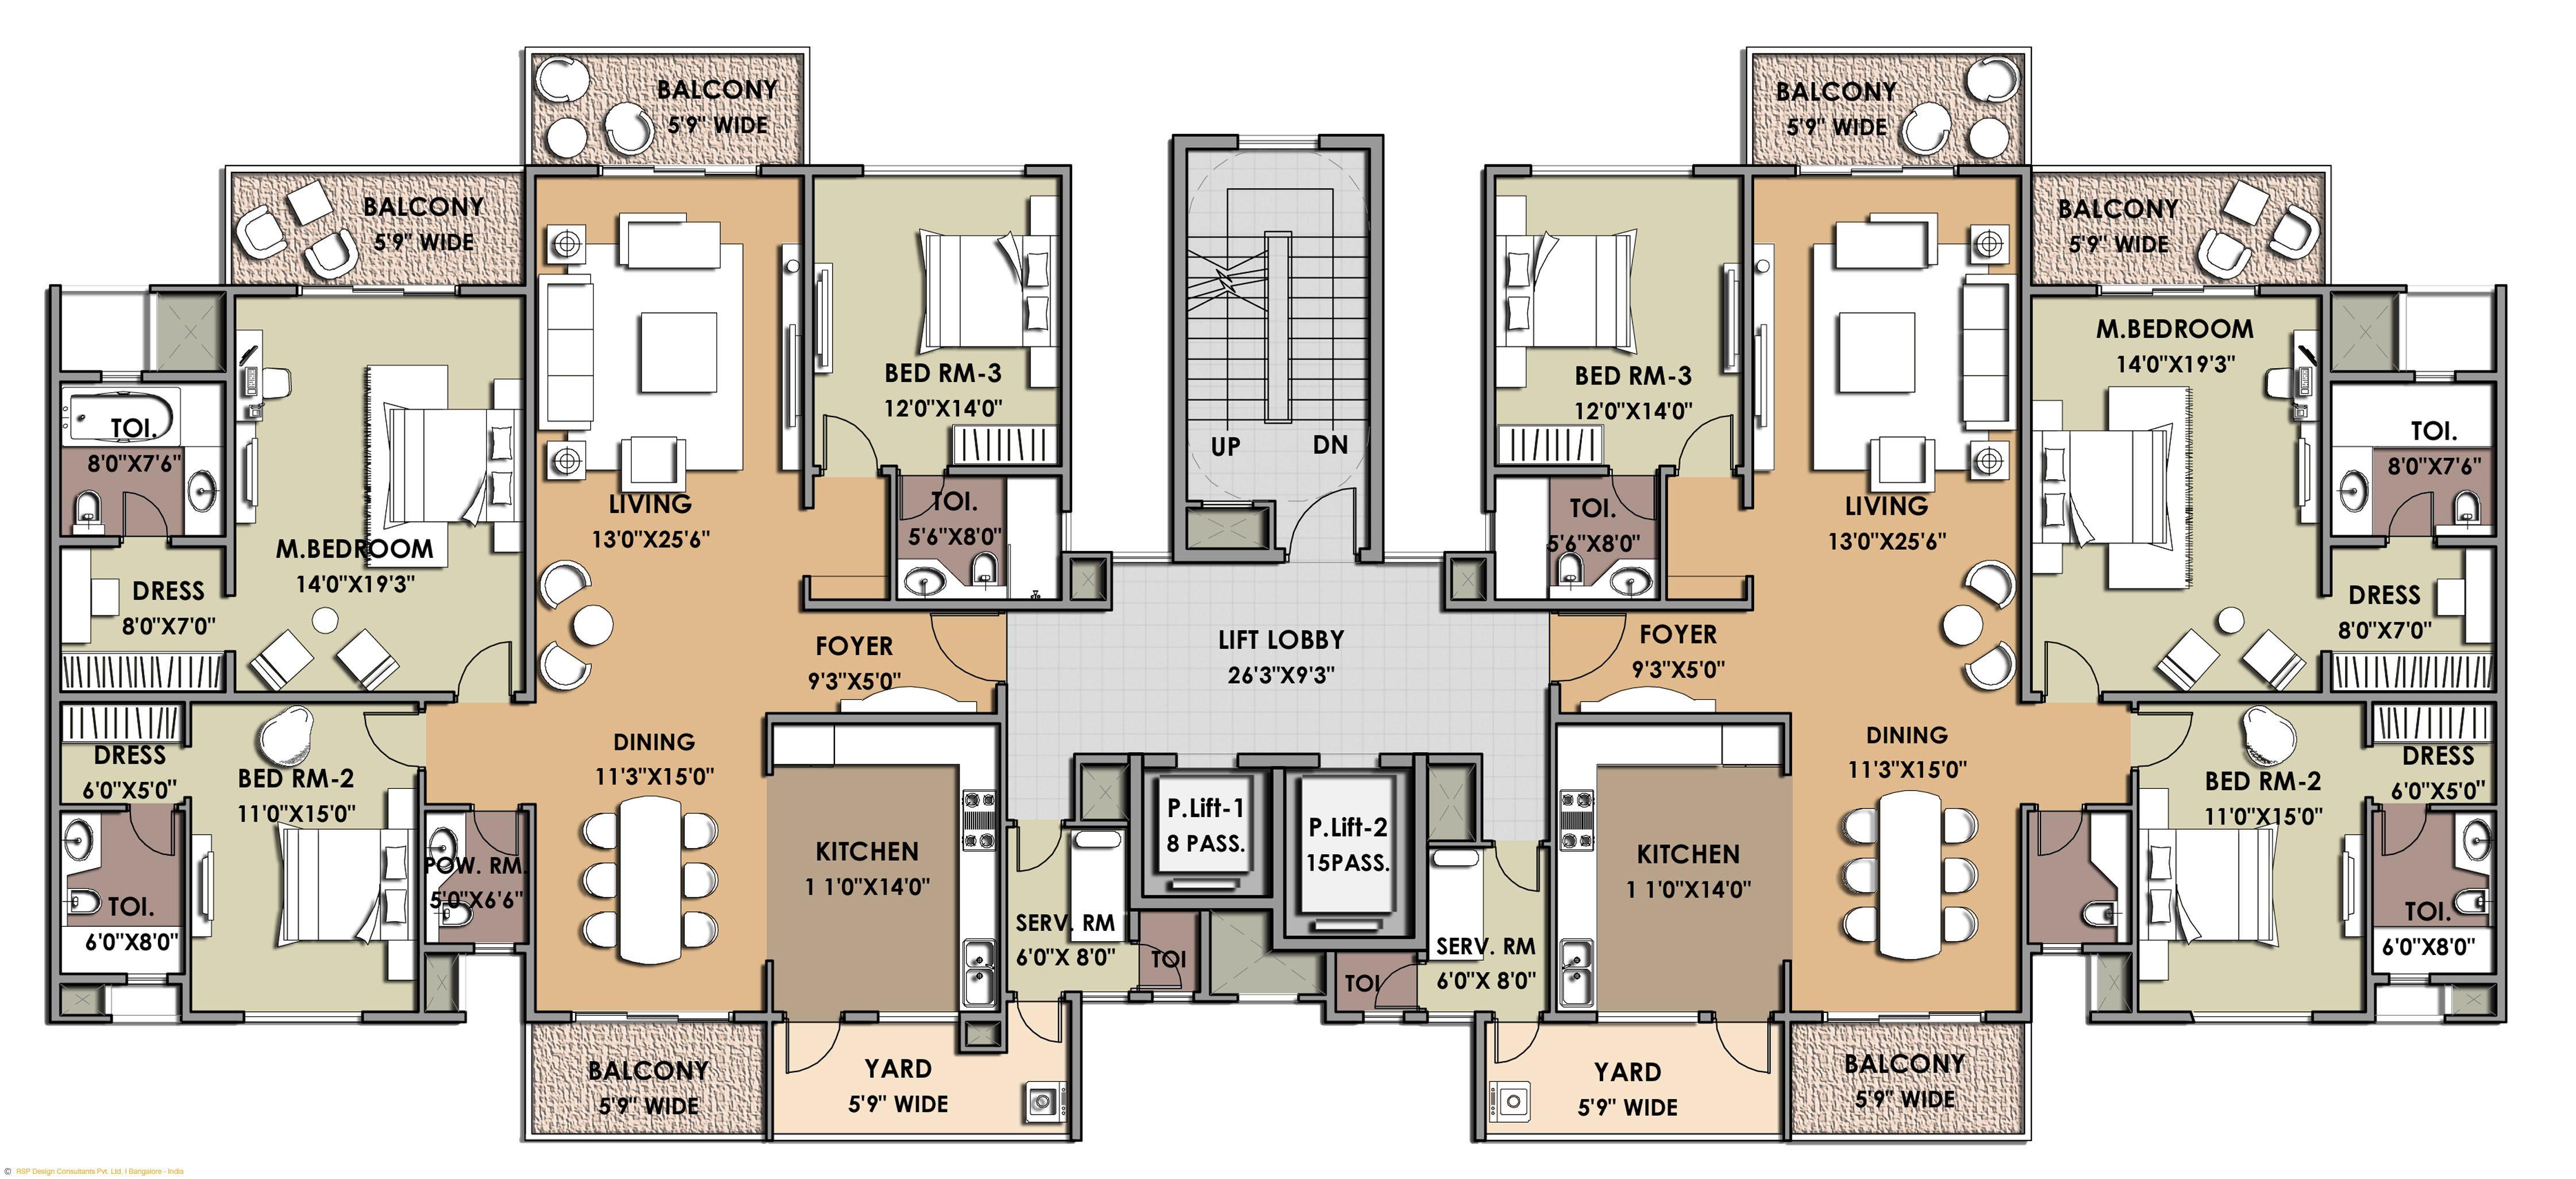 Luxury Apartment Complex Apartment Floor Plans House Floor Plans Residential Building Plan